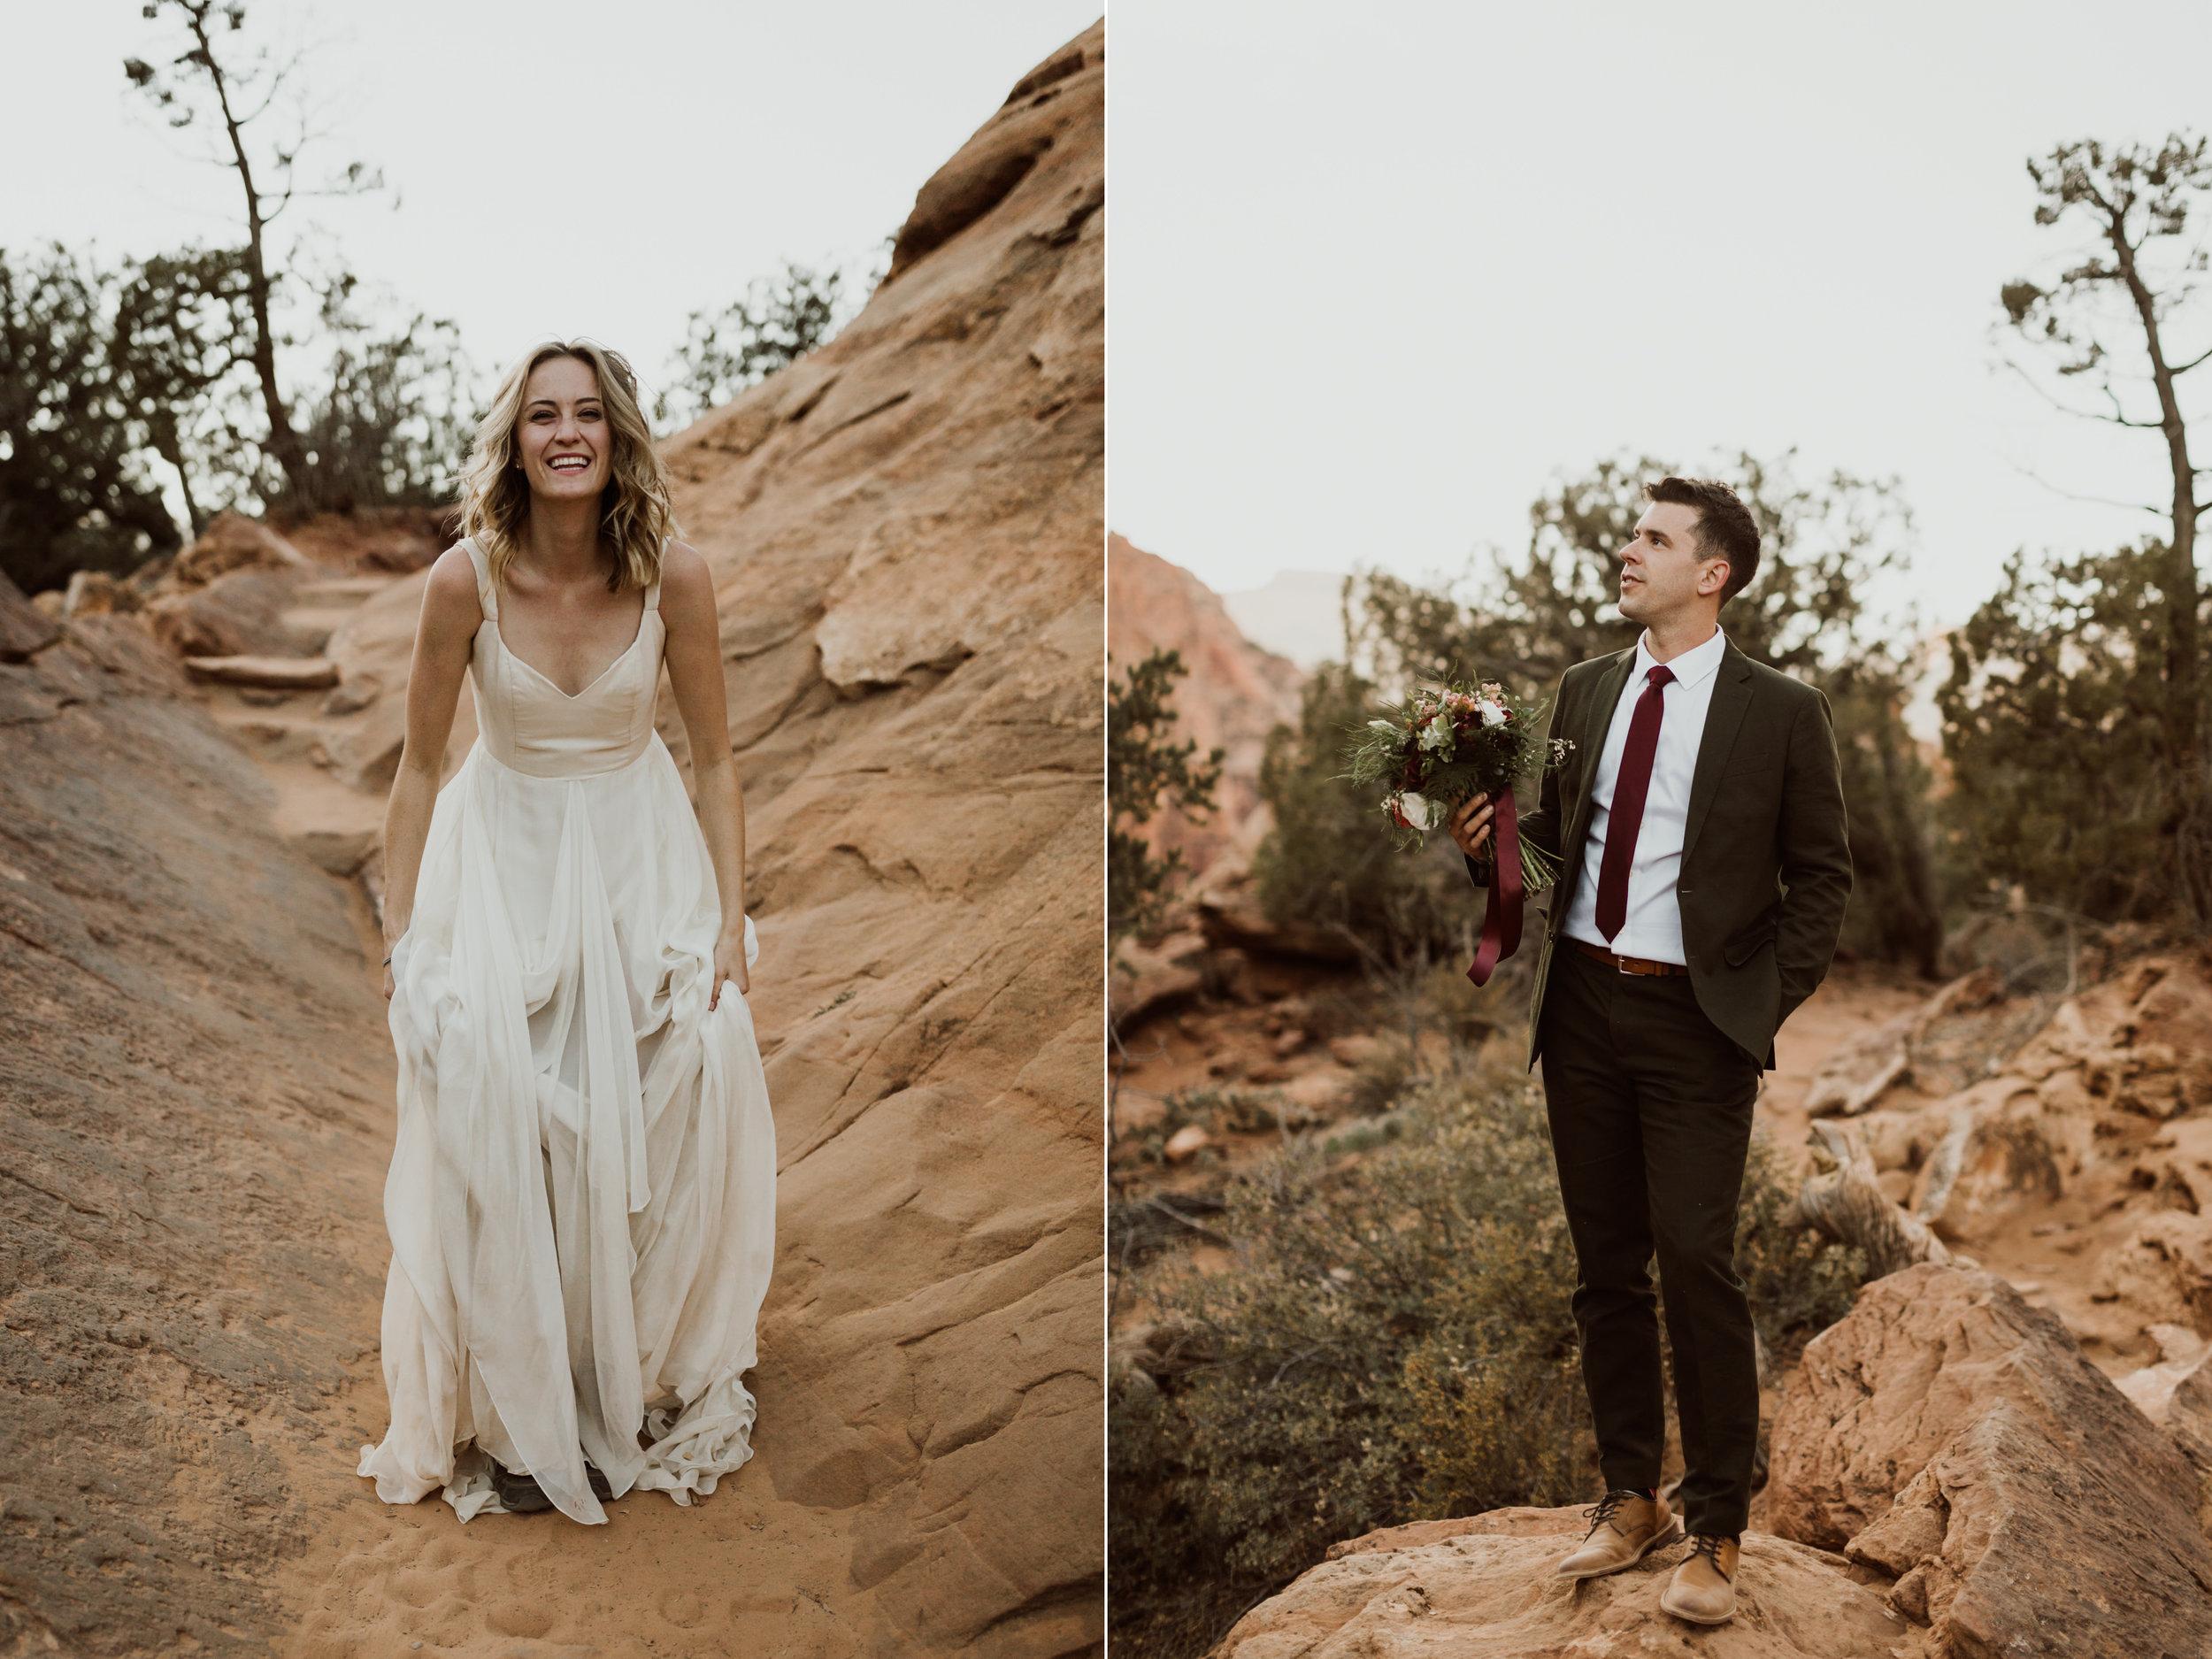 zion-national-park-wedding-168.jpg